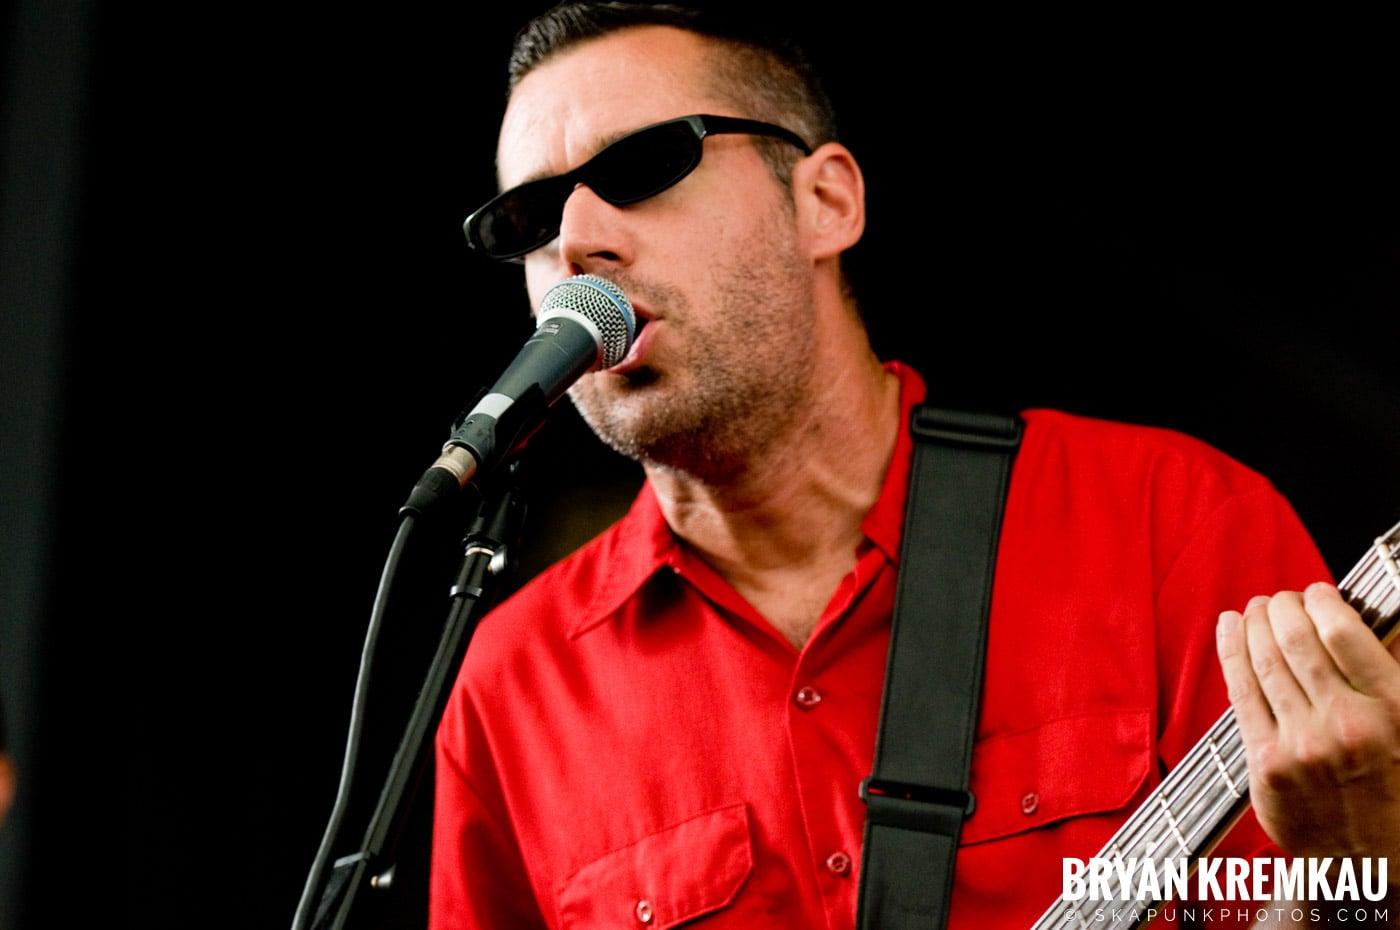 The Aggrolites @ Warped Tour 08, Scranton PA - 7.27.08 (9)